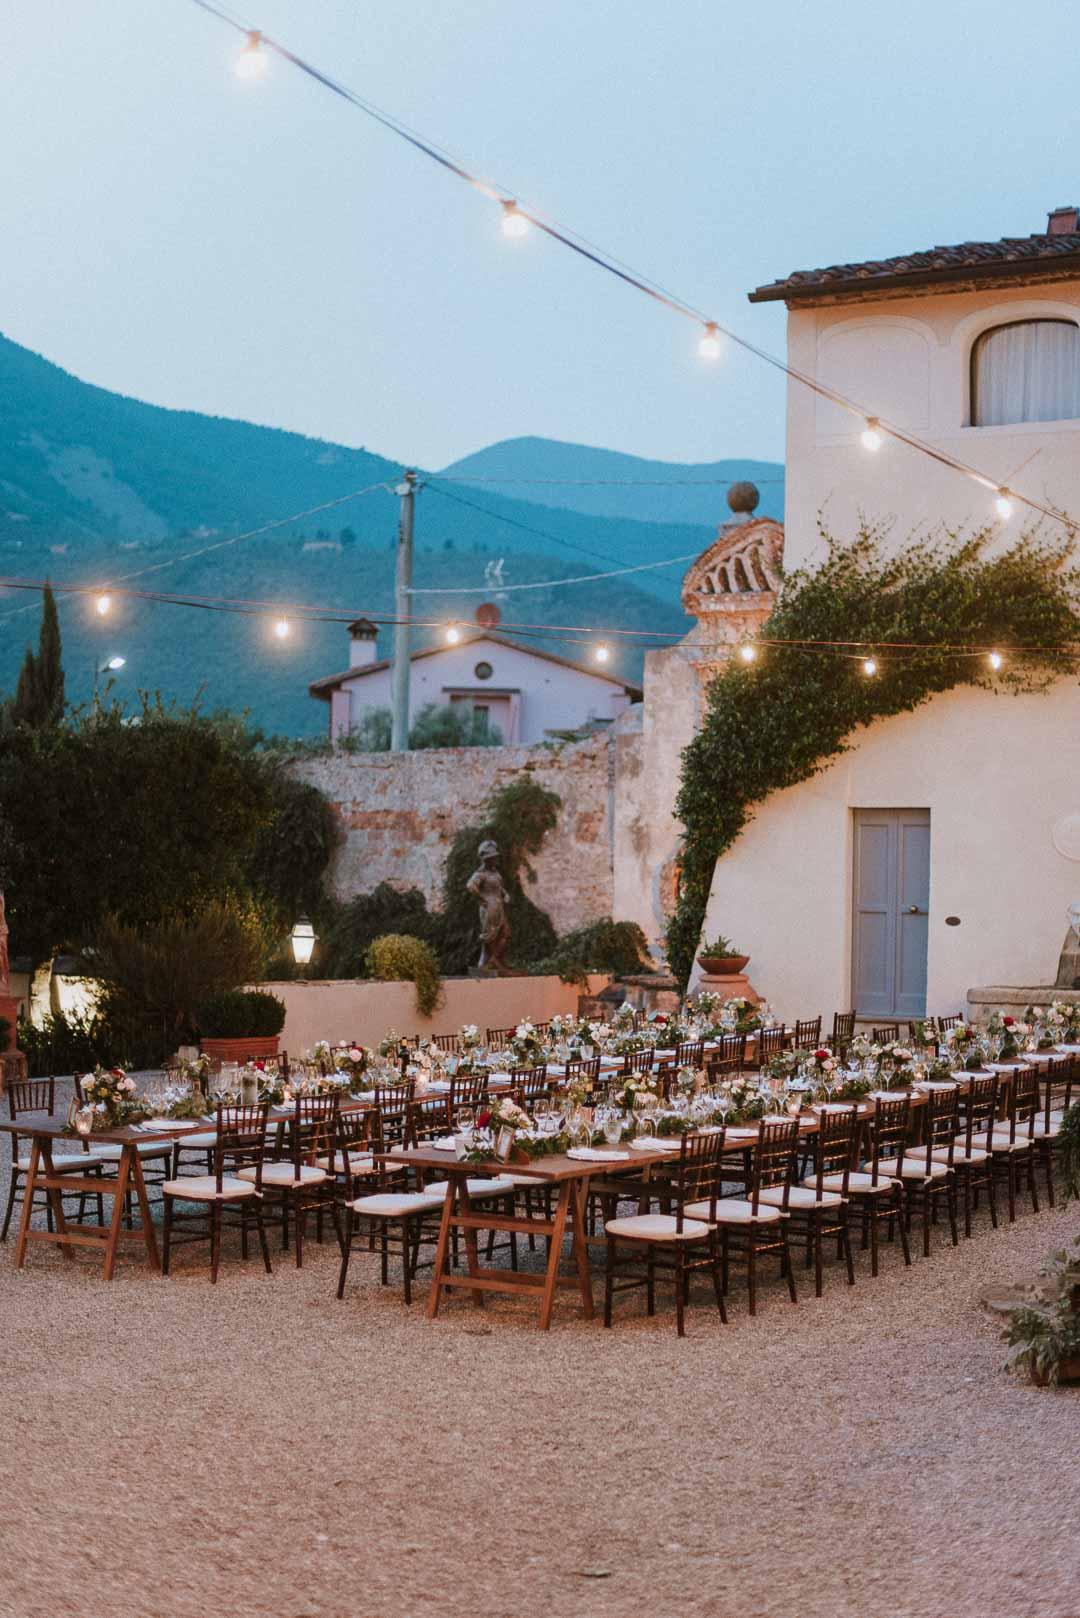 wedding-photographer-destination-fineart-bespoke-reportage-tuscany-villascorzi-vivianeizzo-spazio46-157